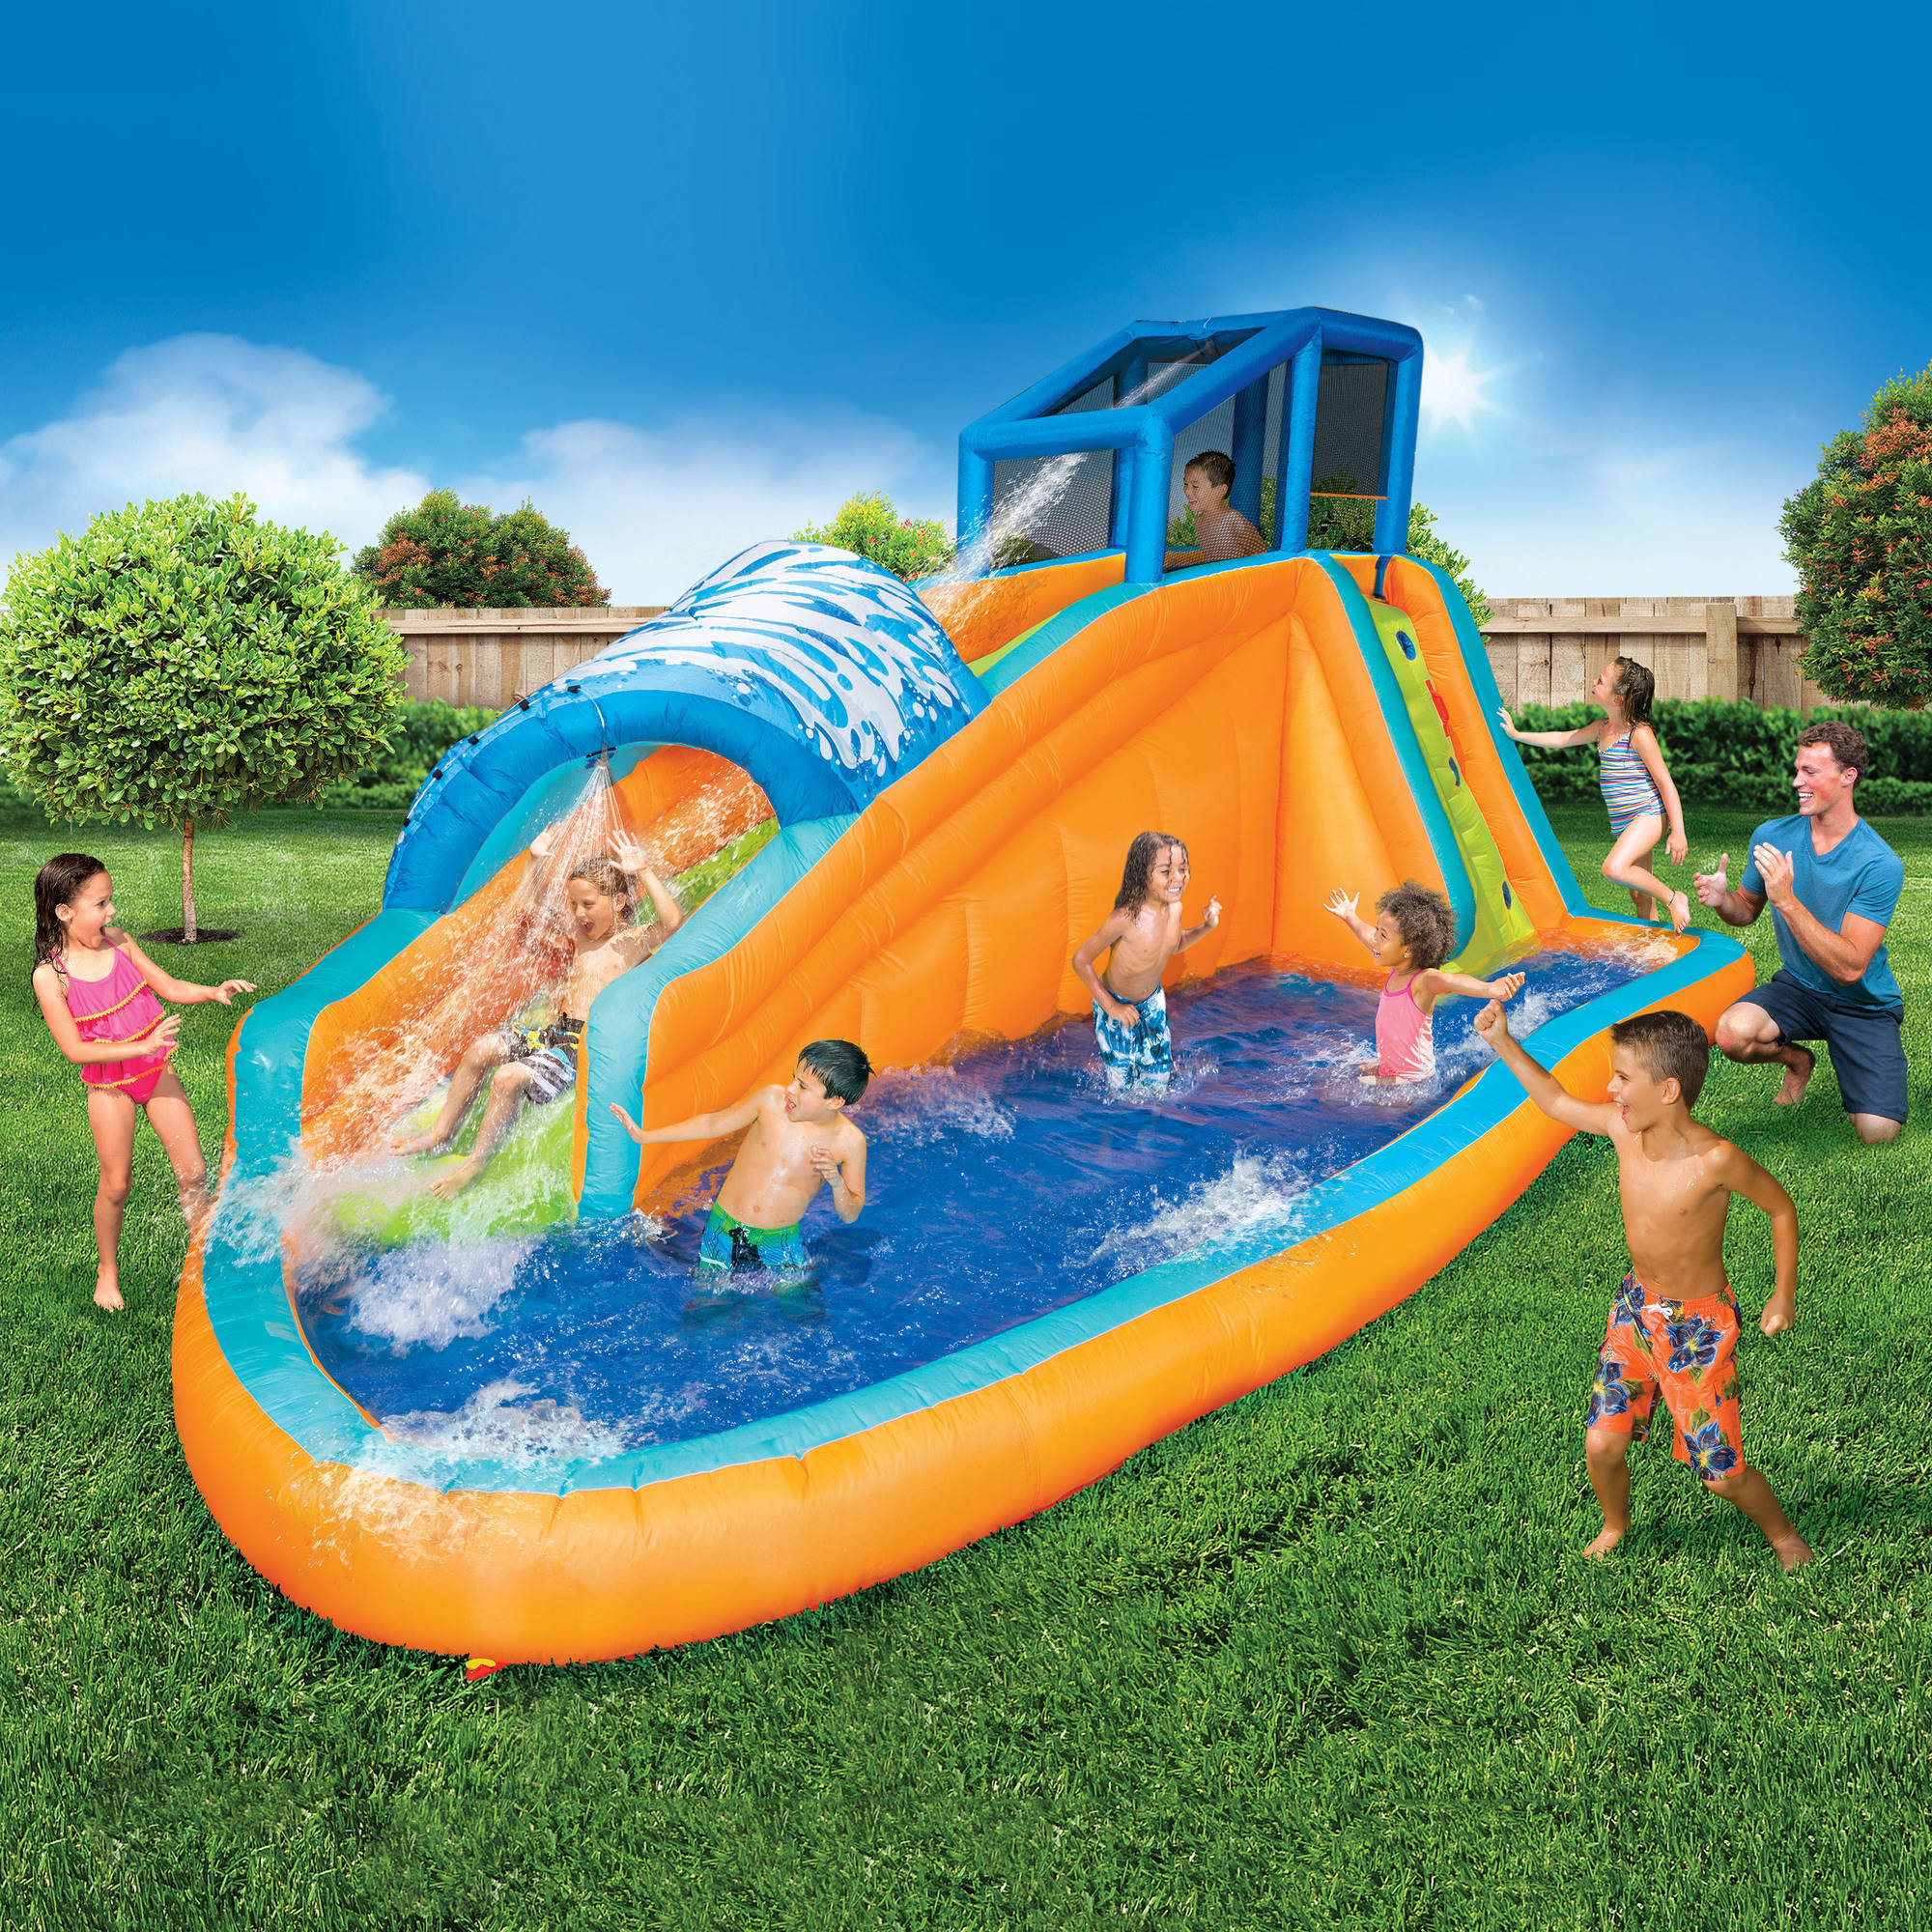 Banzai Surf Rider Aqua Park Inflatable Water Slide Backyard Summer Fun Pool